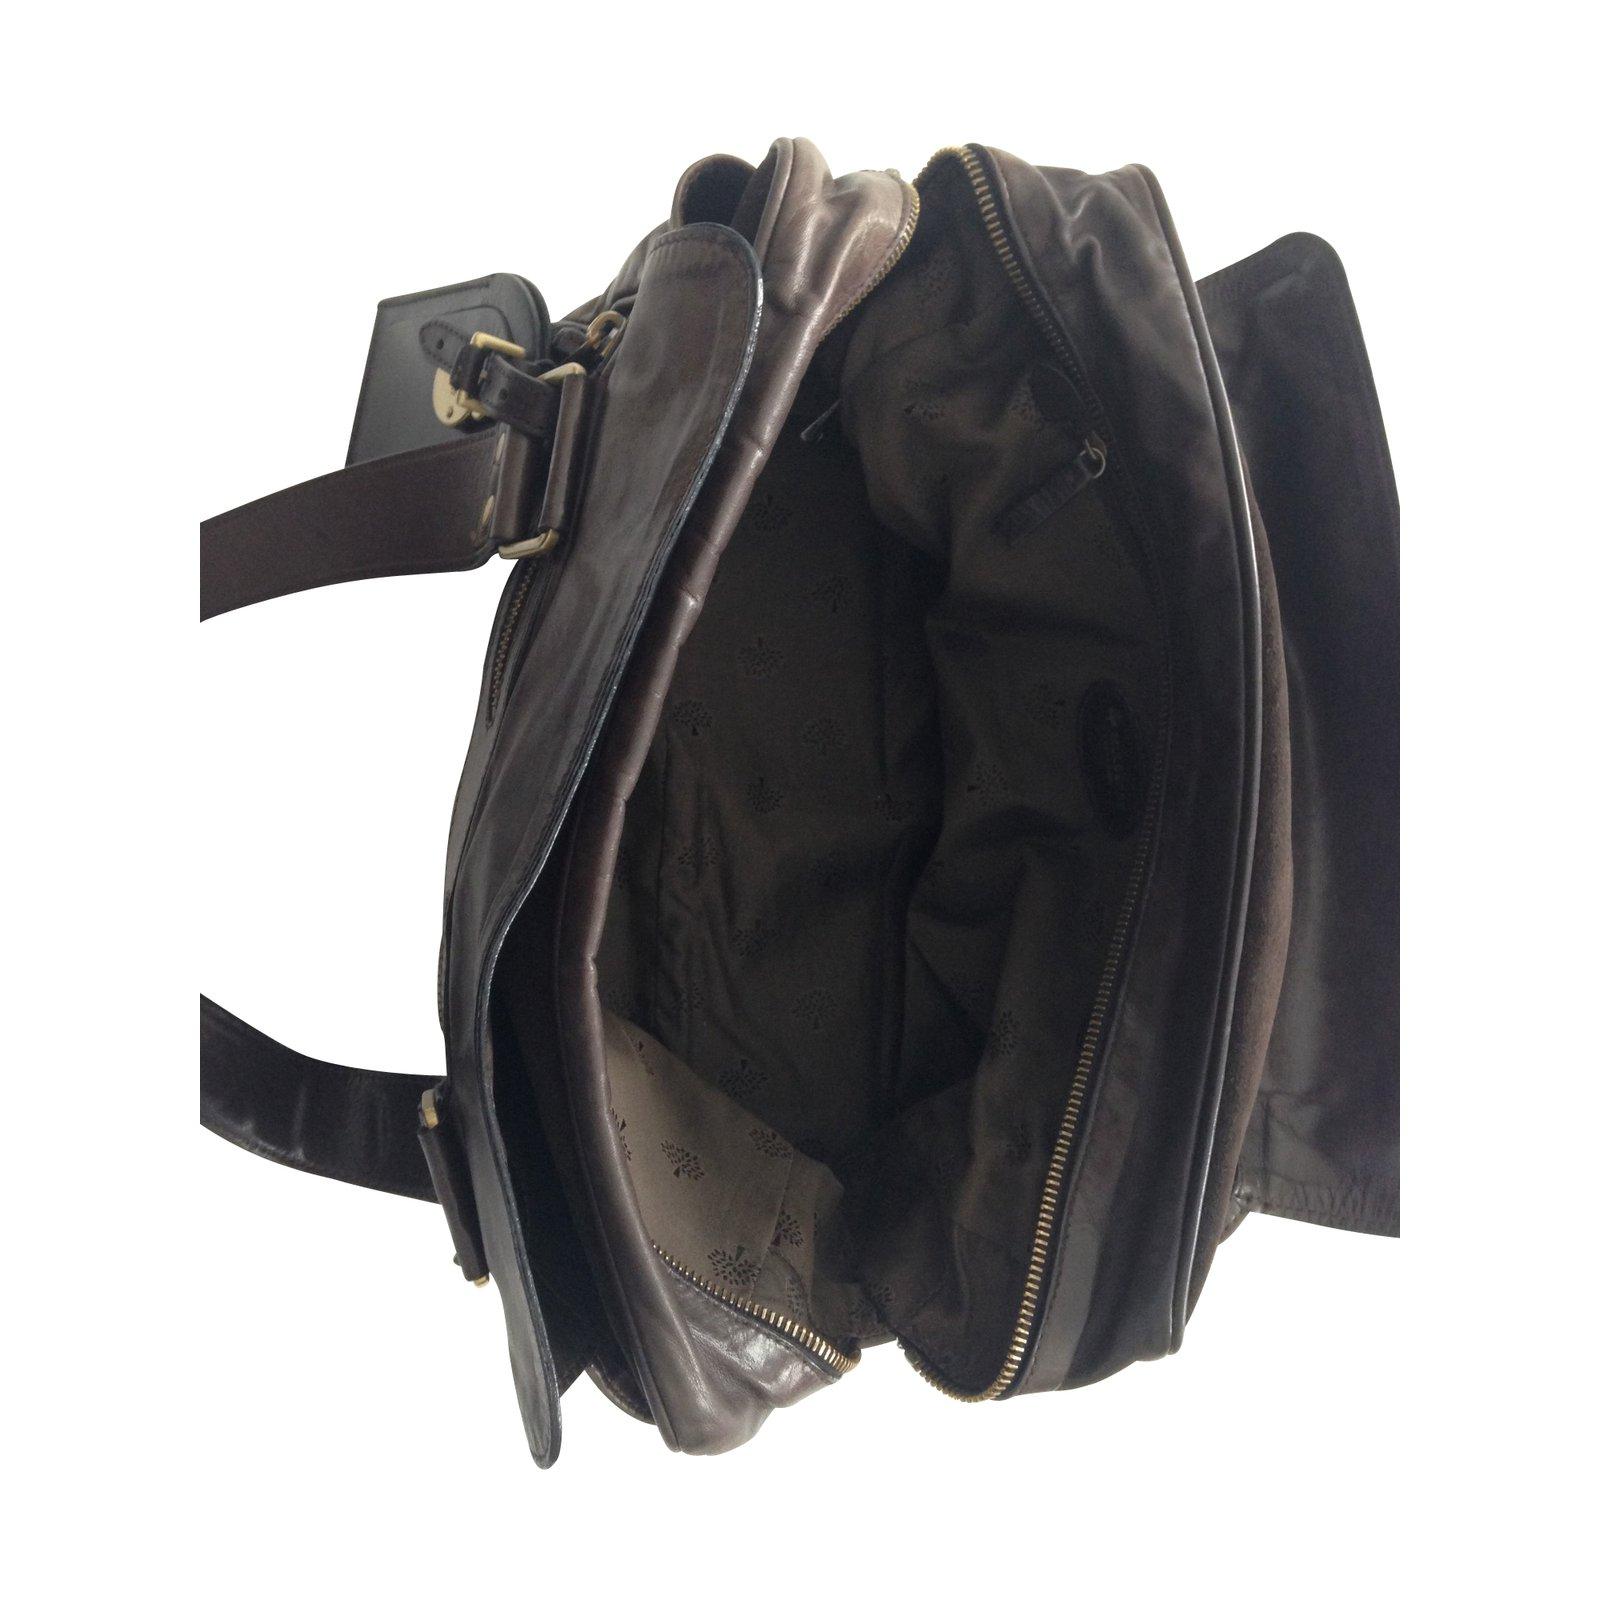 b937582c6cf9 Facebook · Pin This. Mulberry Handbags Handbags Leather Brown ref.6595